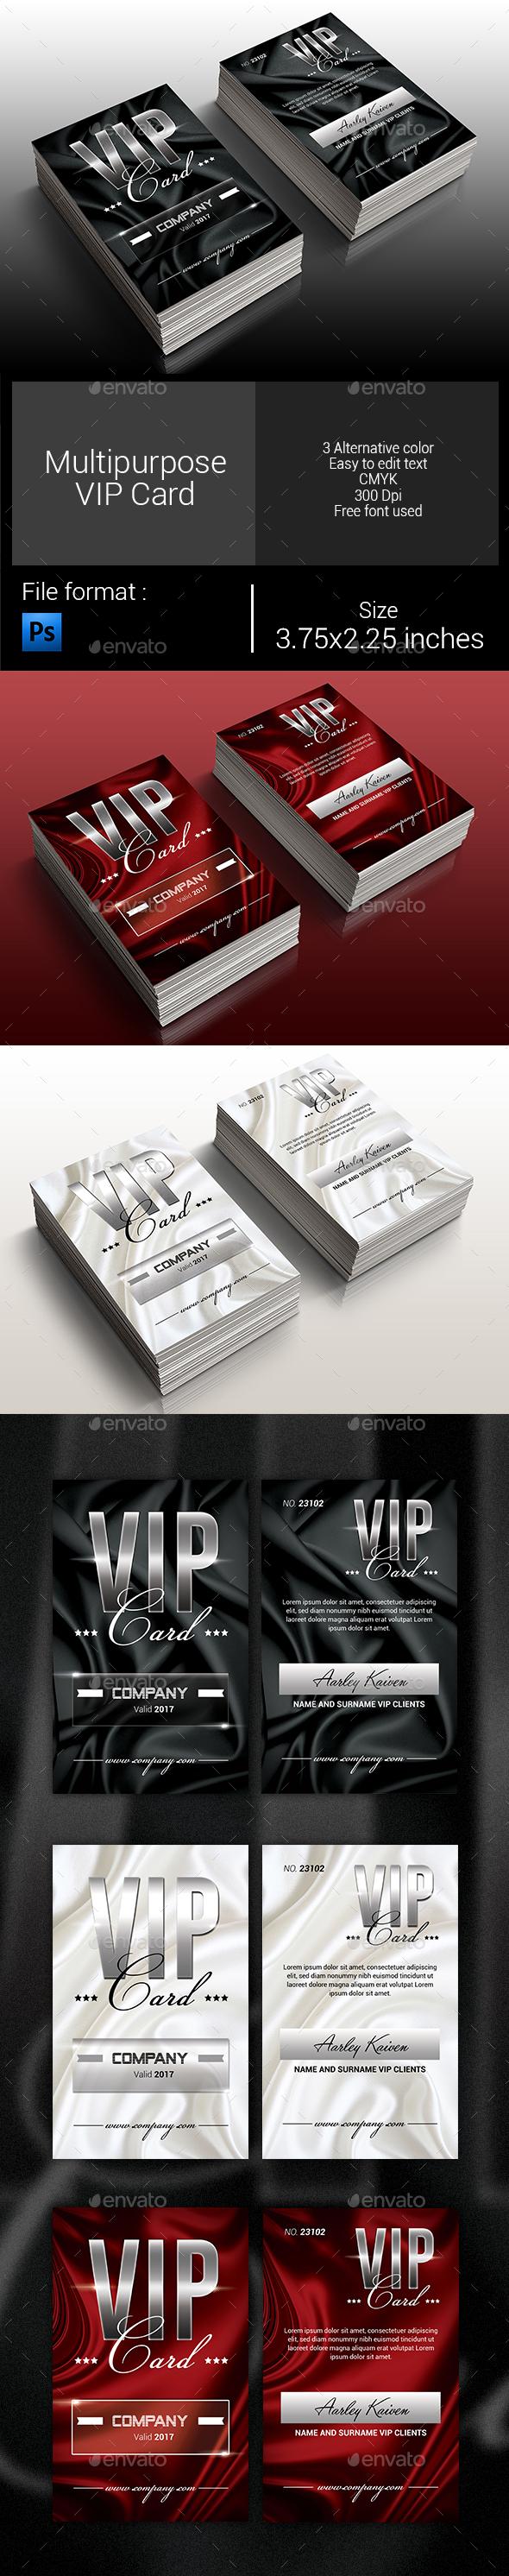 Multipurpose Elegant Vip Card - Loyalty Cards Cards & Invites